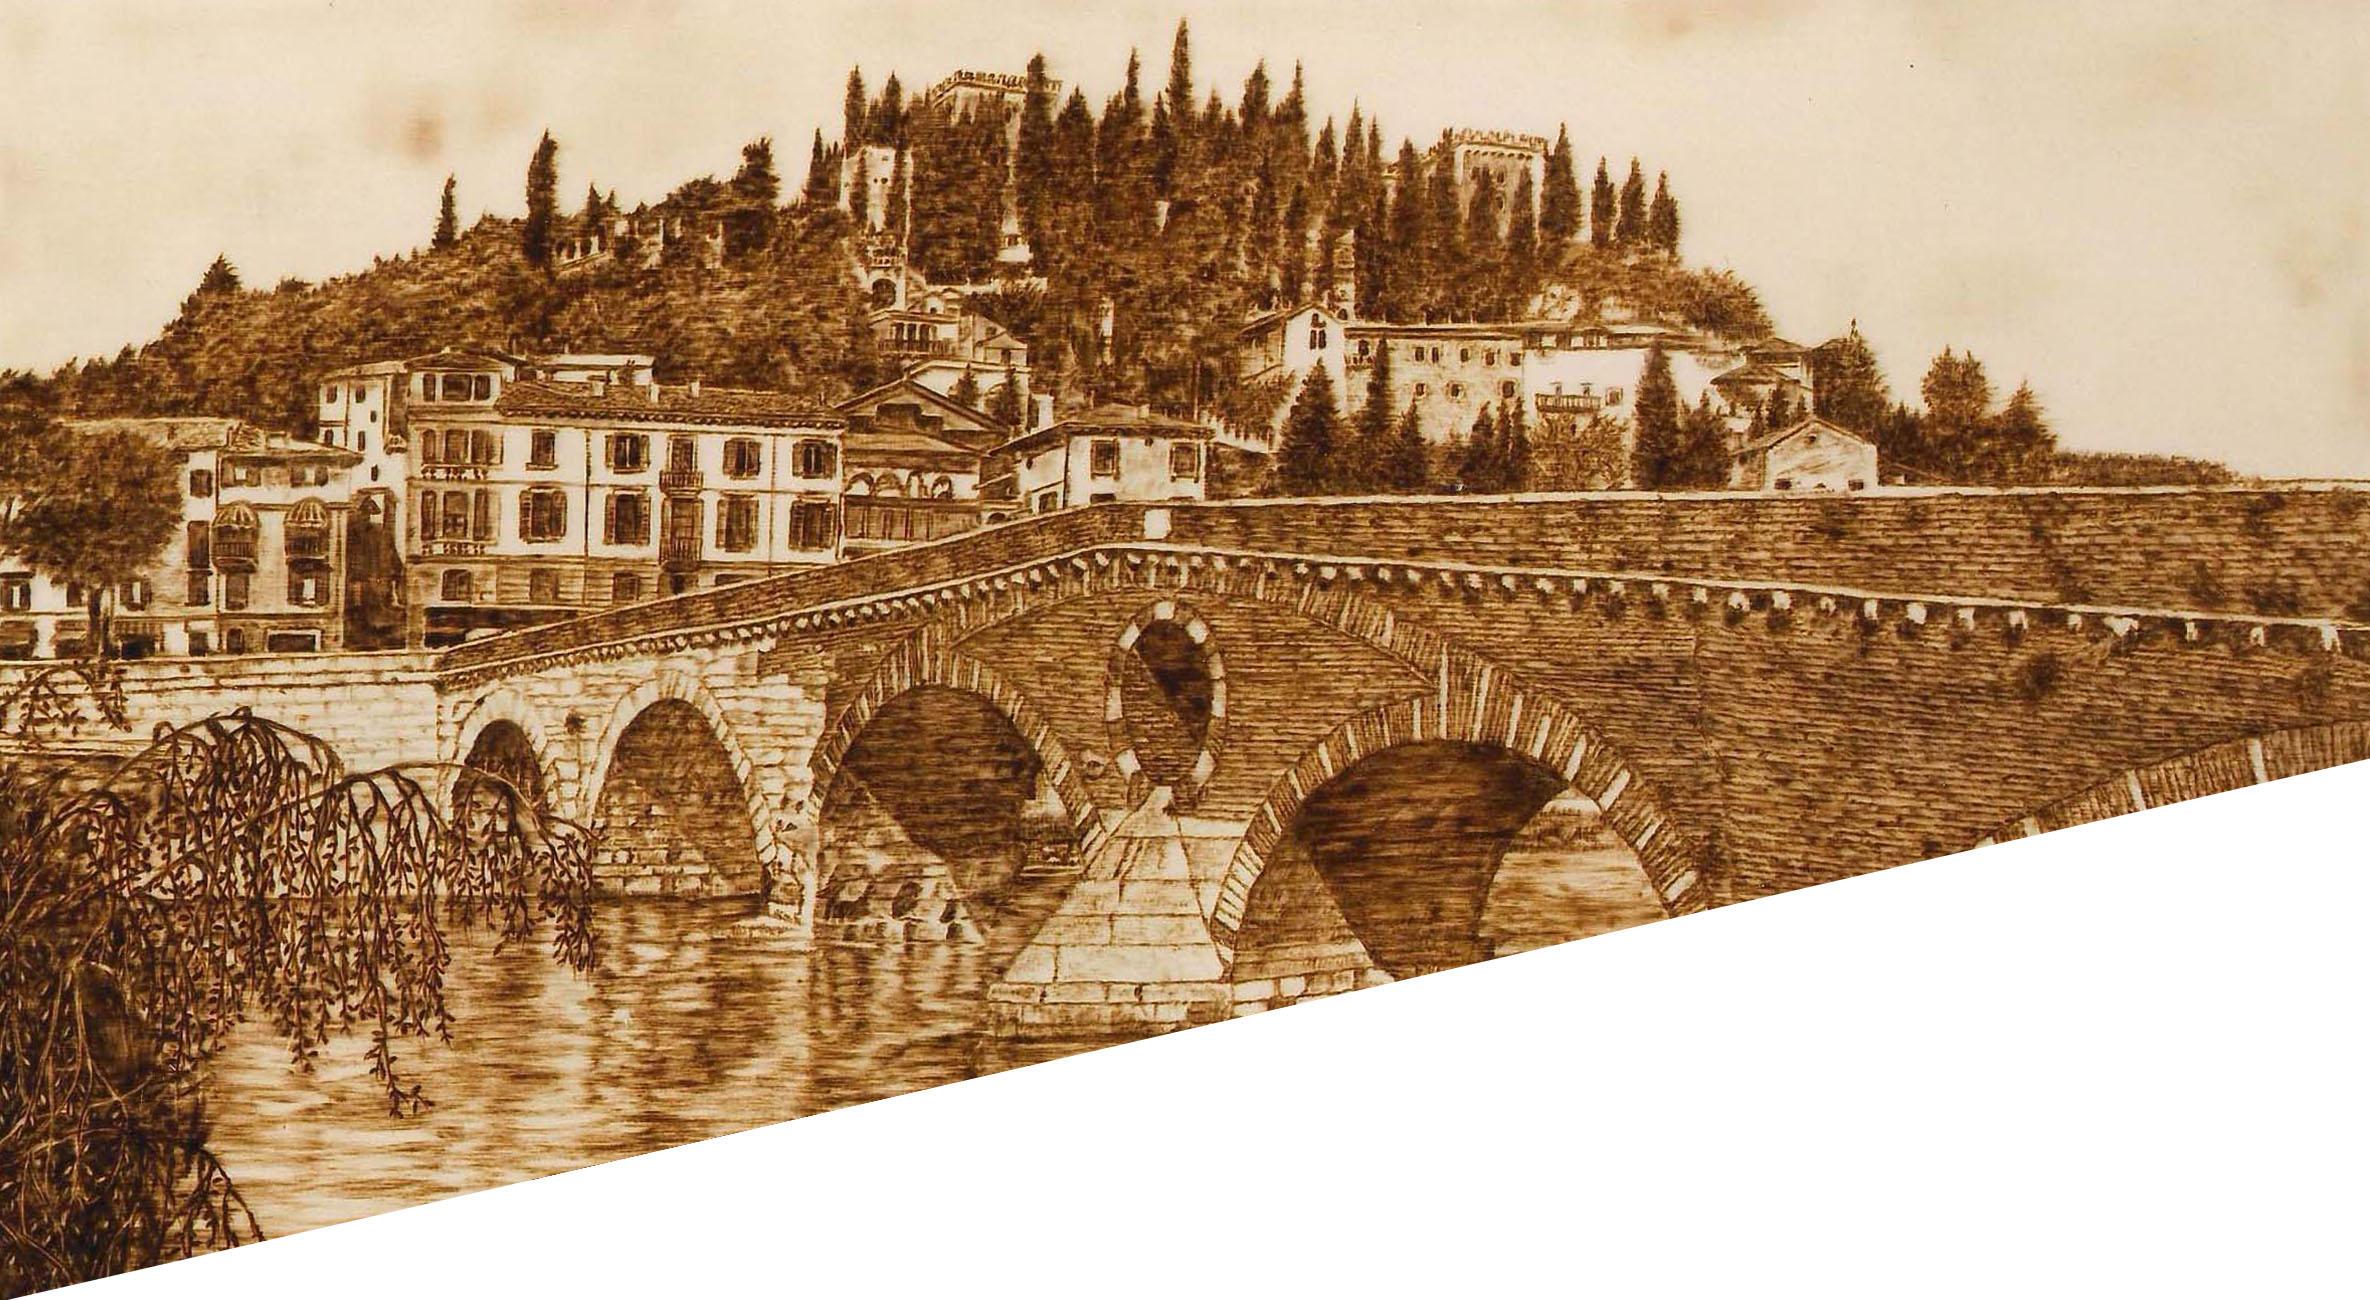 pirografia-renzo-gaioni-arte-artigianato-2